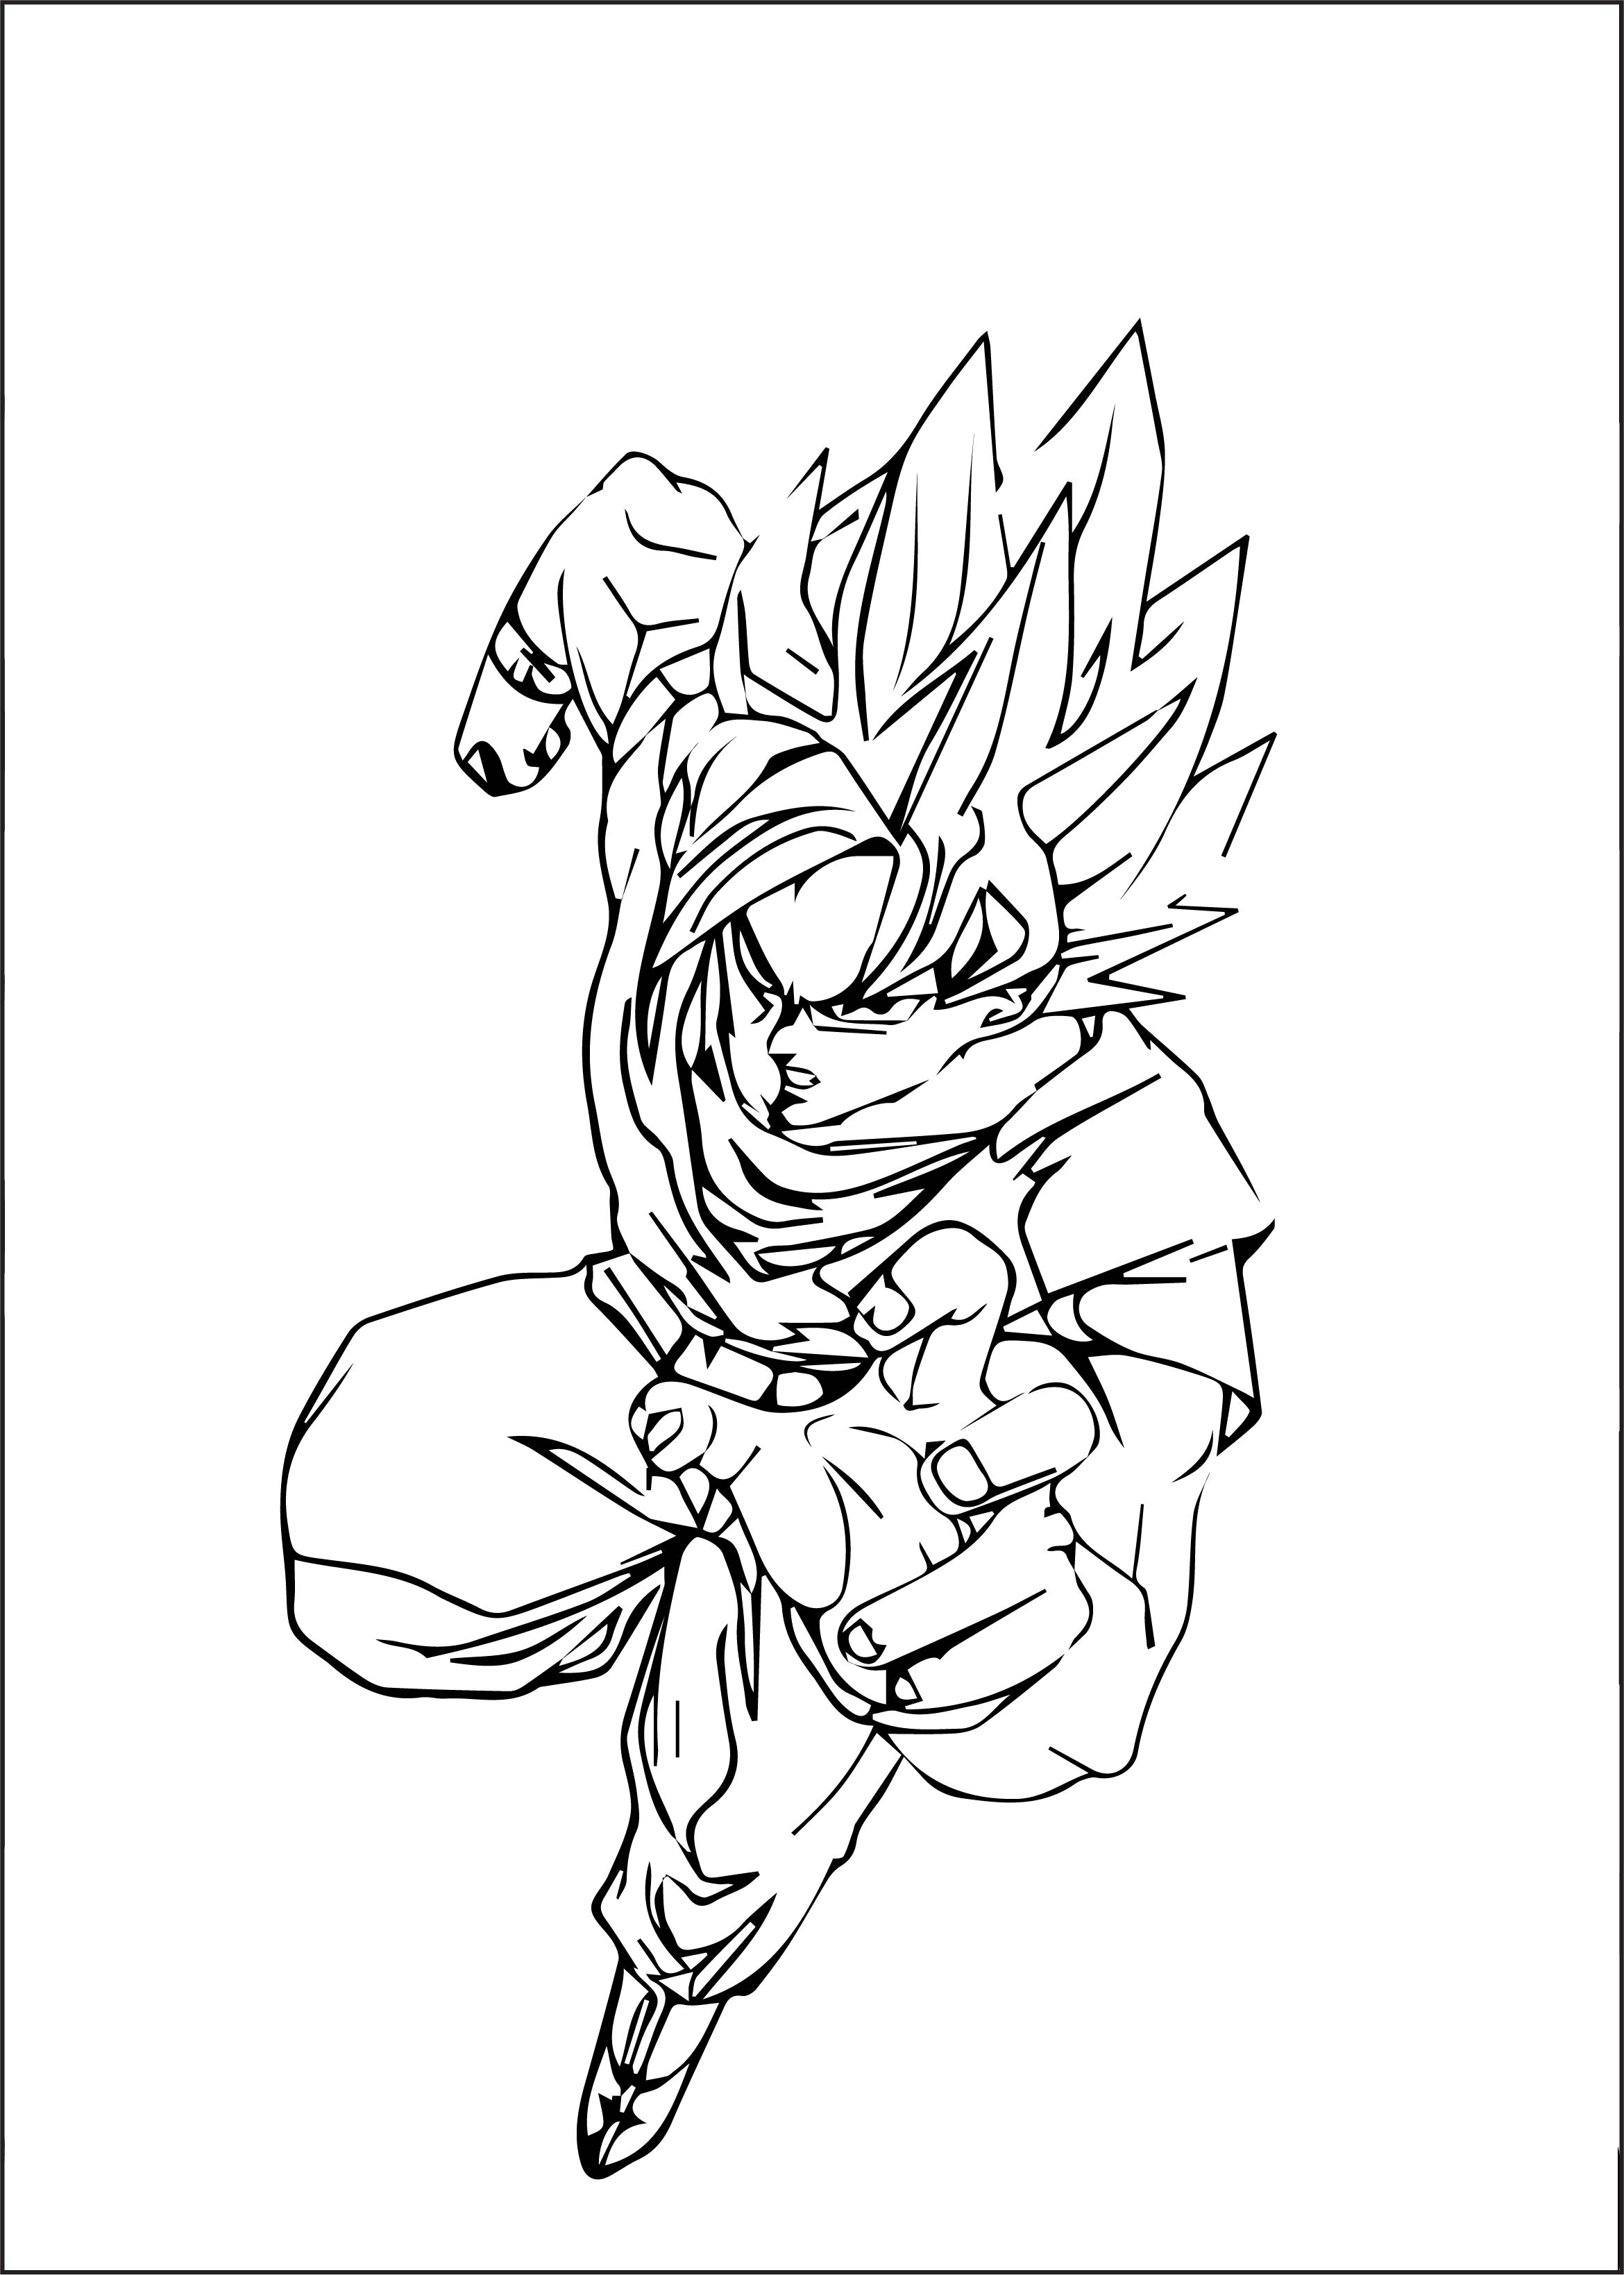 Goku We Coloring Page 290